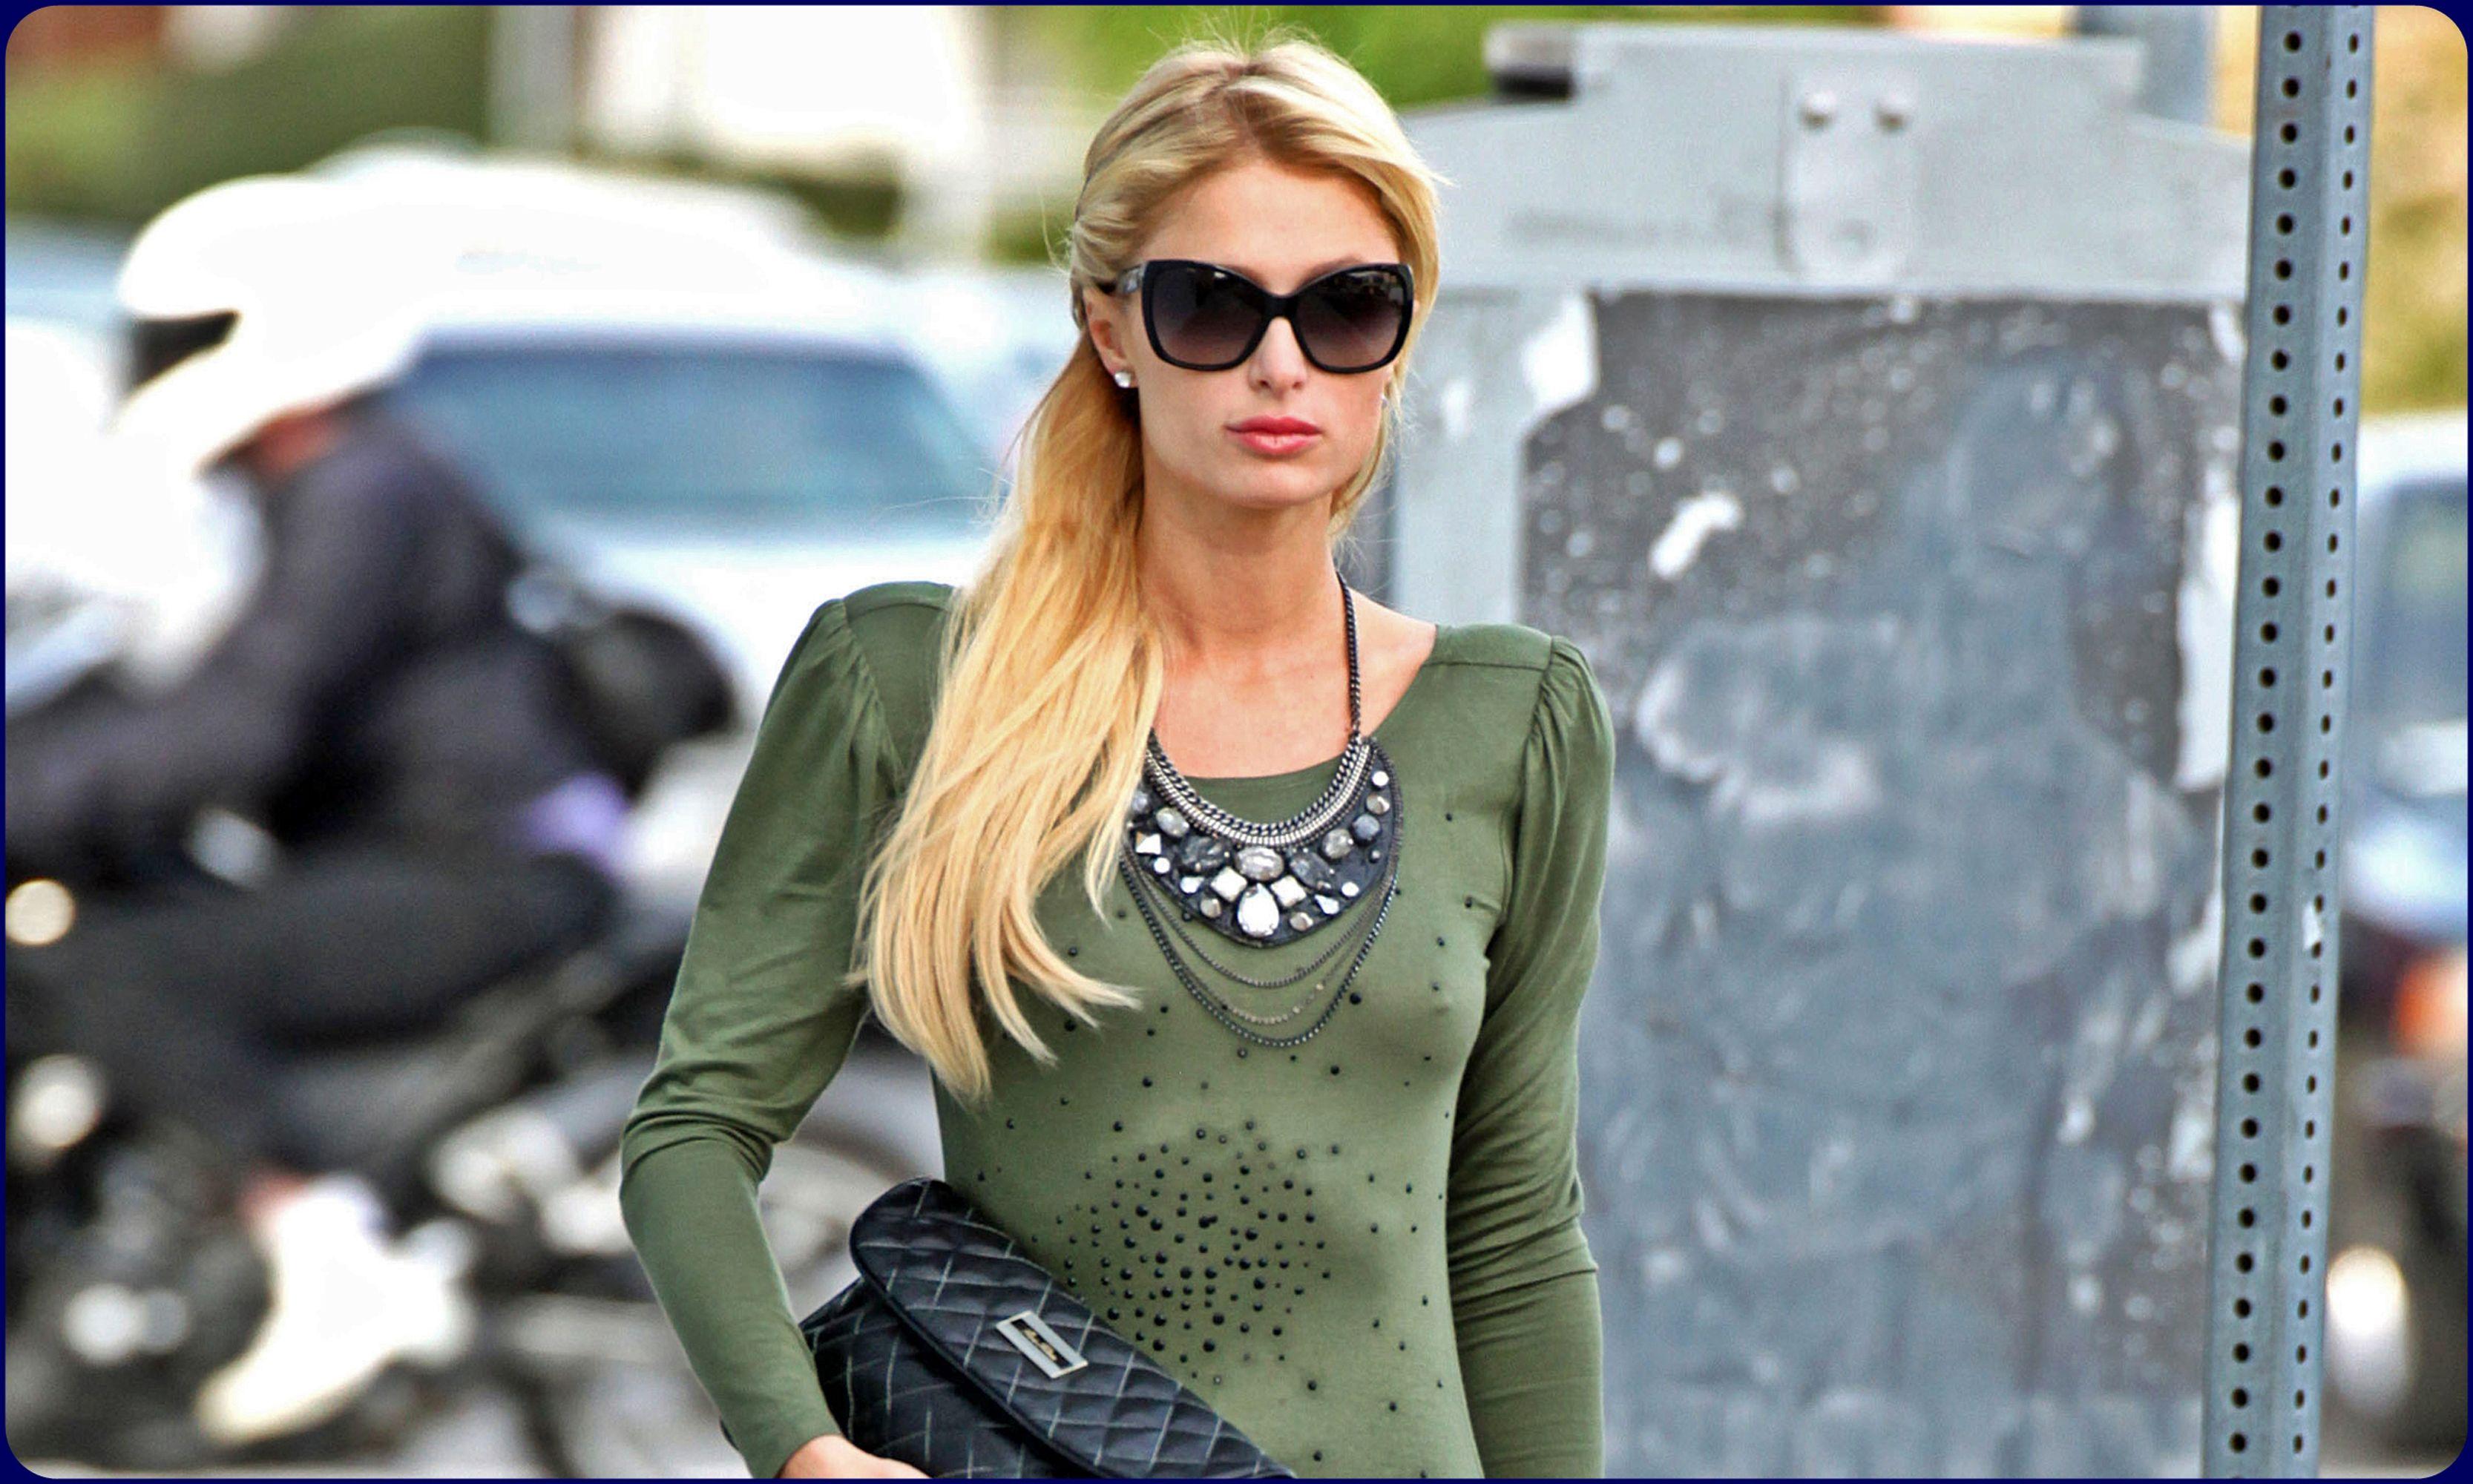 Paris Hilton fappening leak